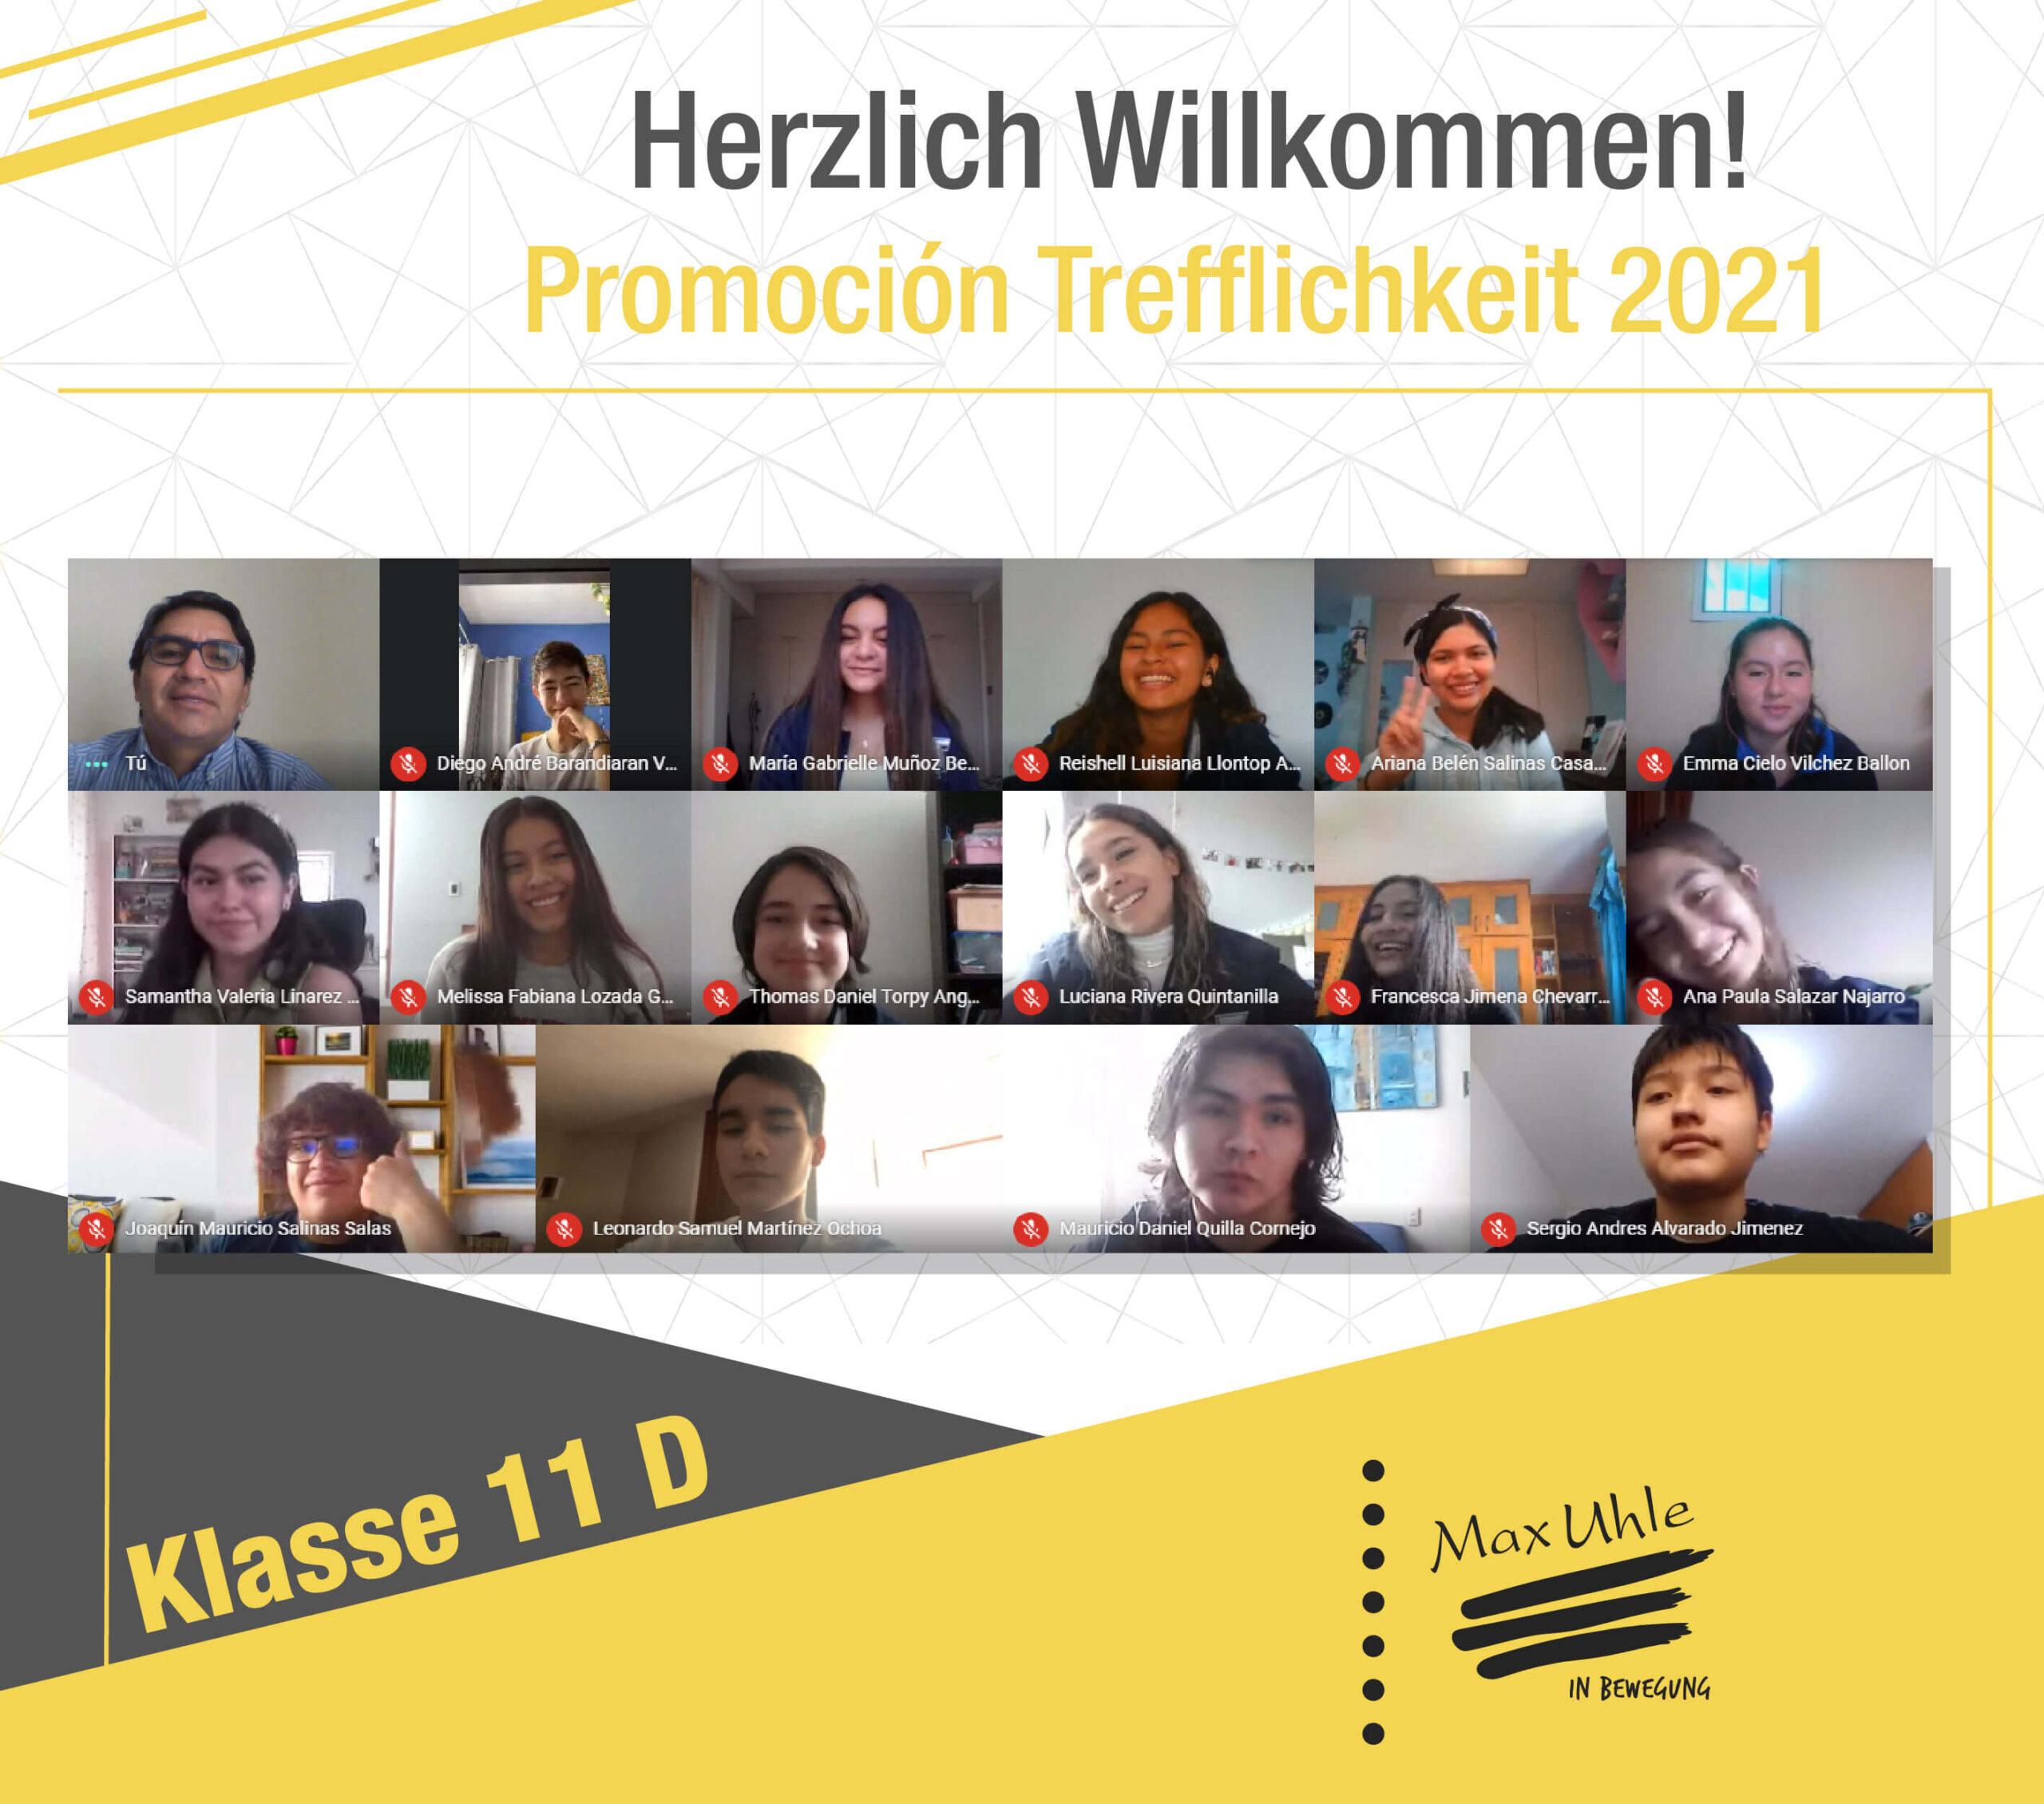 regreso a clases promocion trefflichkeit 2021 clase 11D